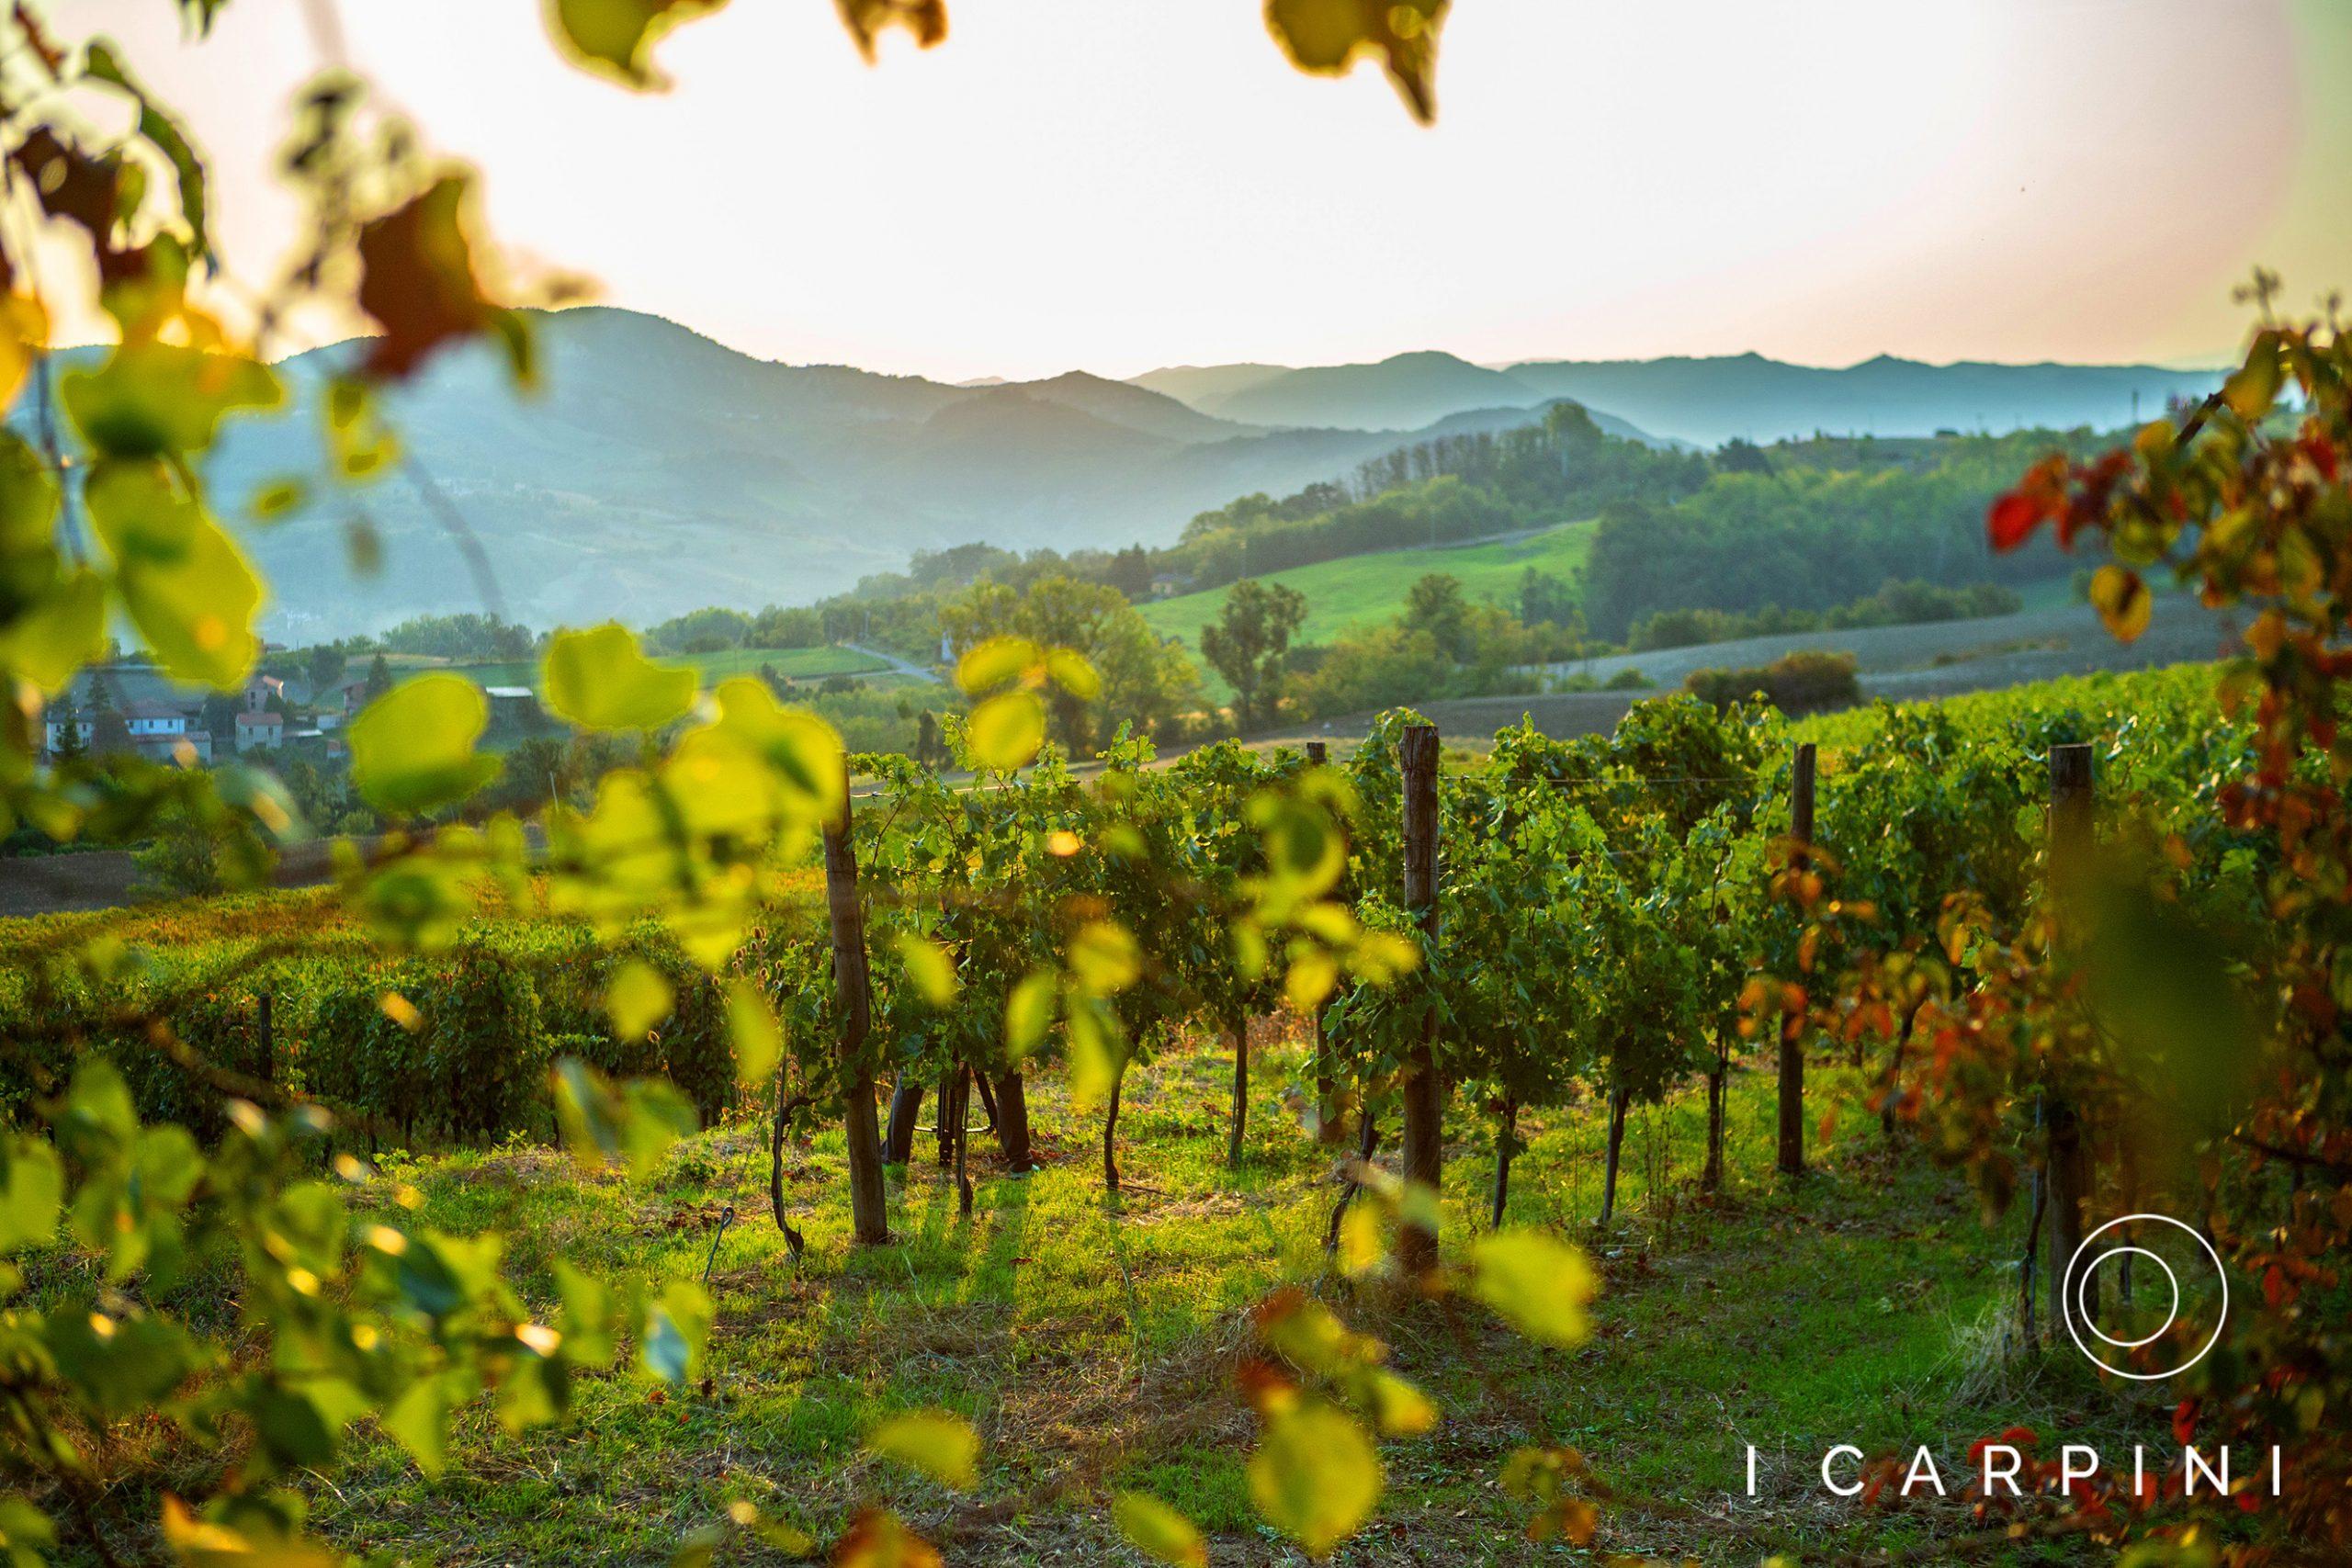 Cascina I Carpini_sunkissed vineyard